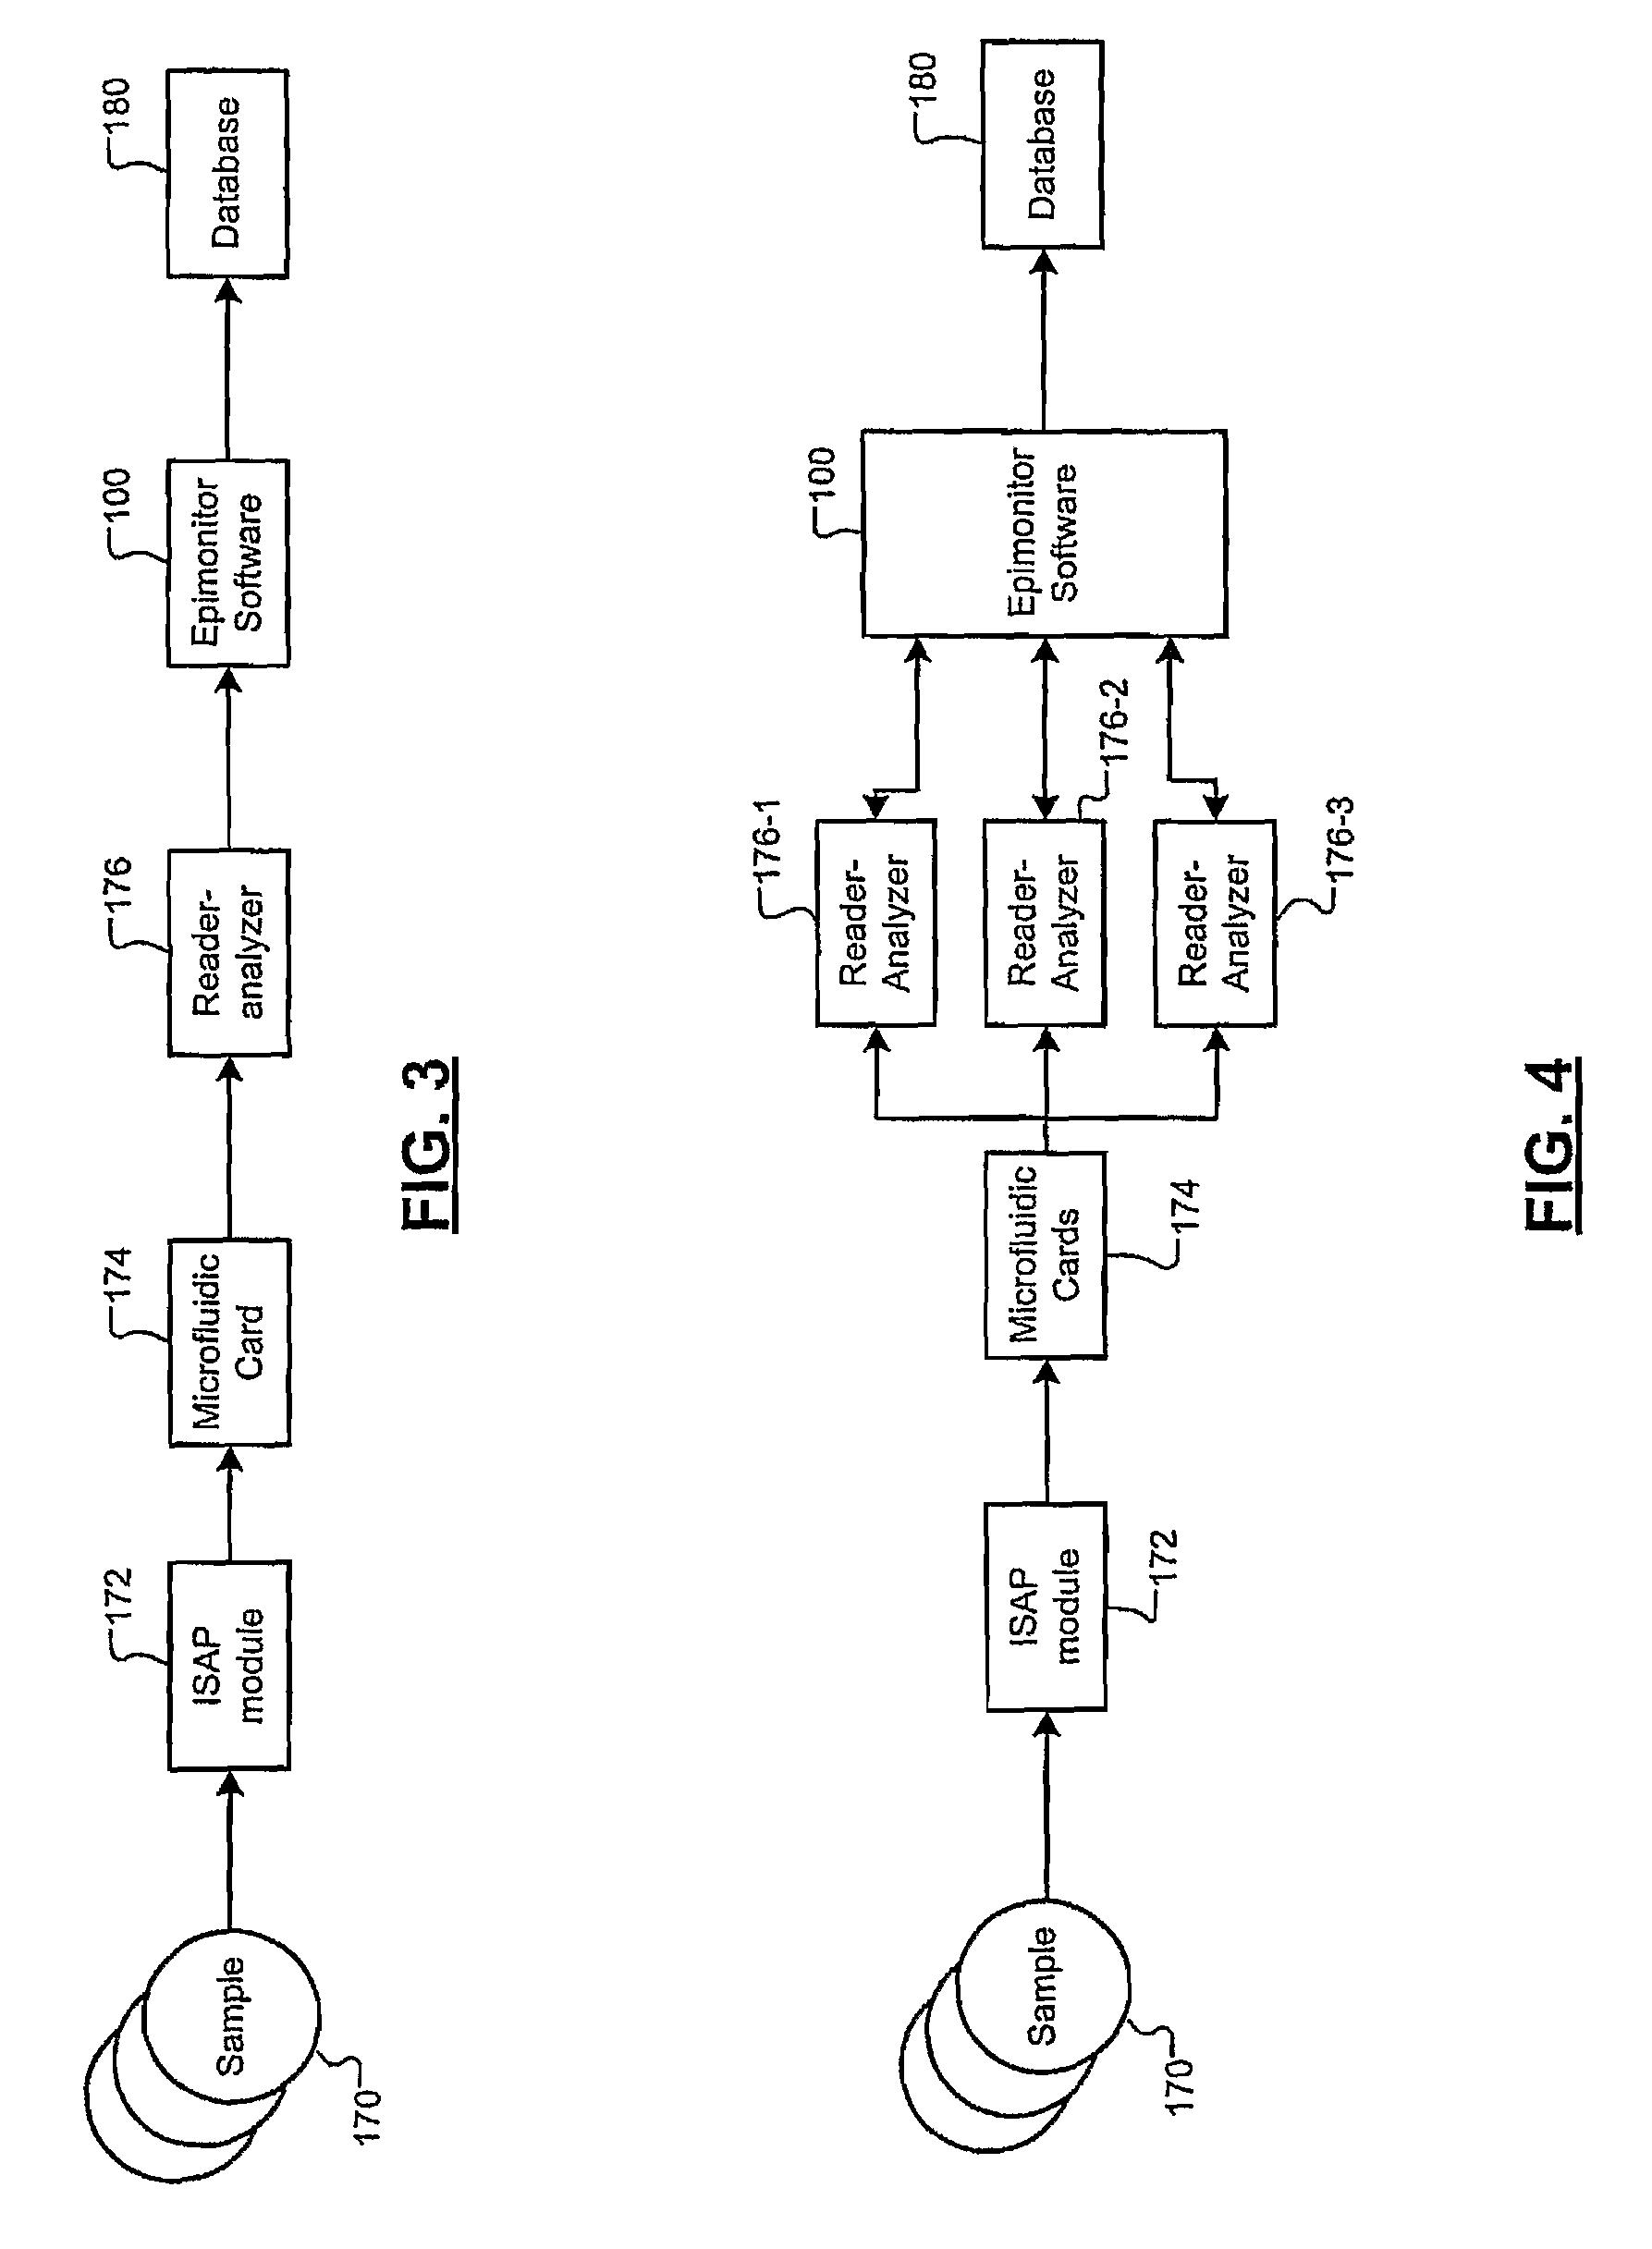 Patent US 10,181,010 B2